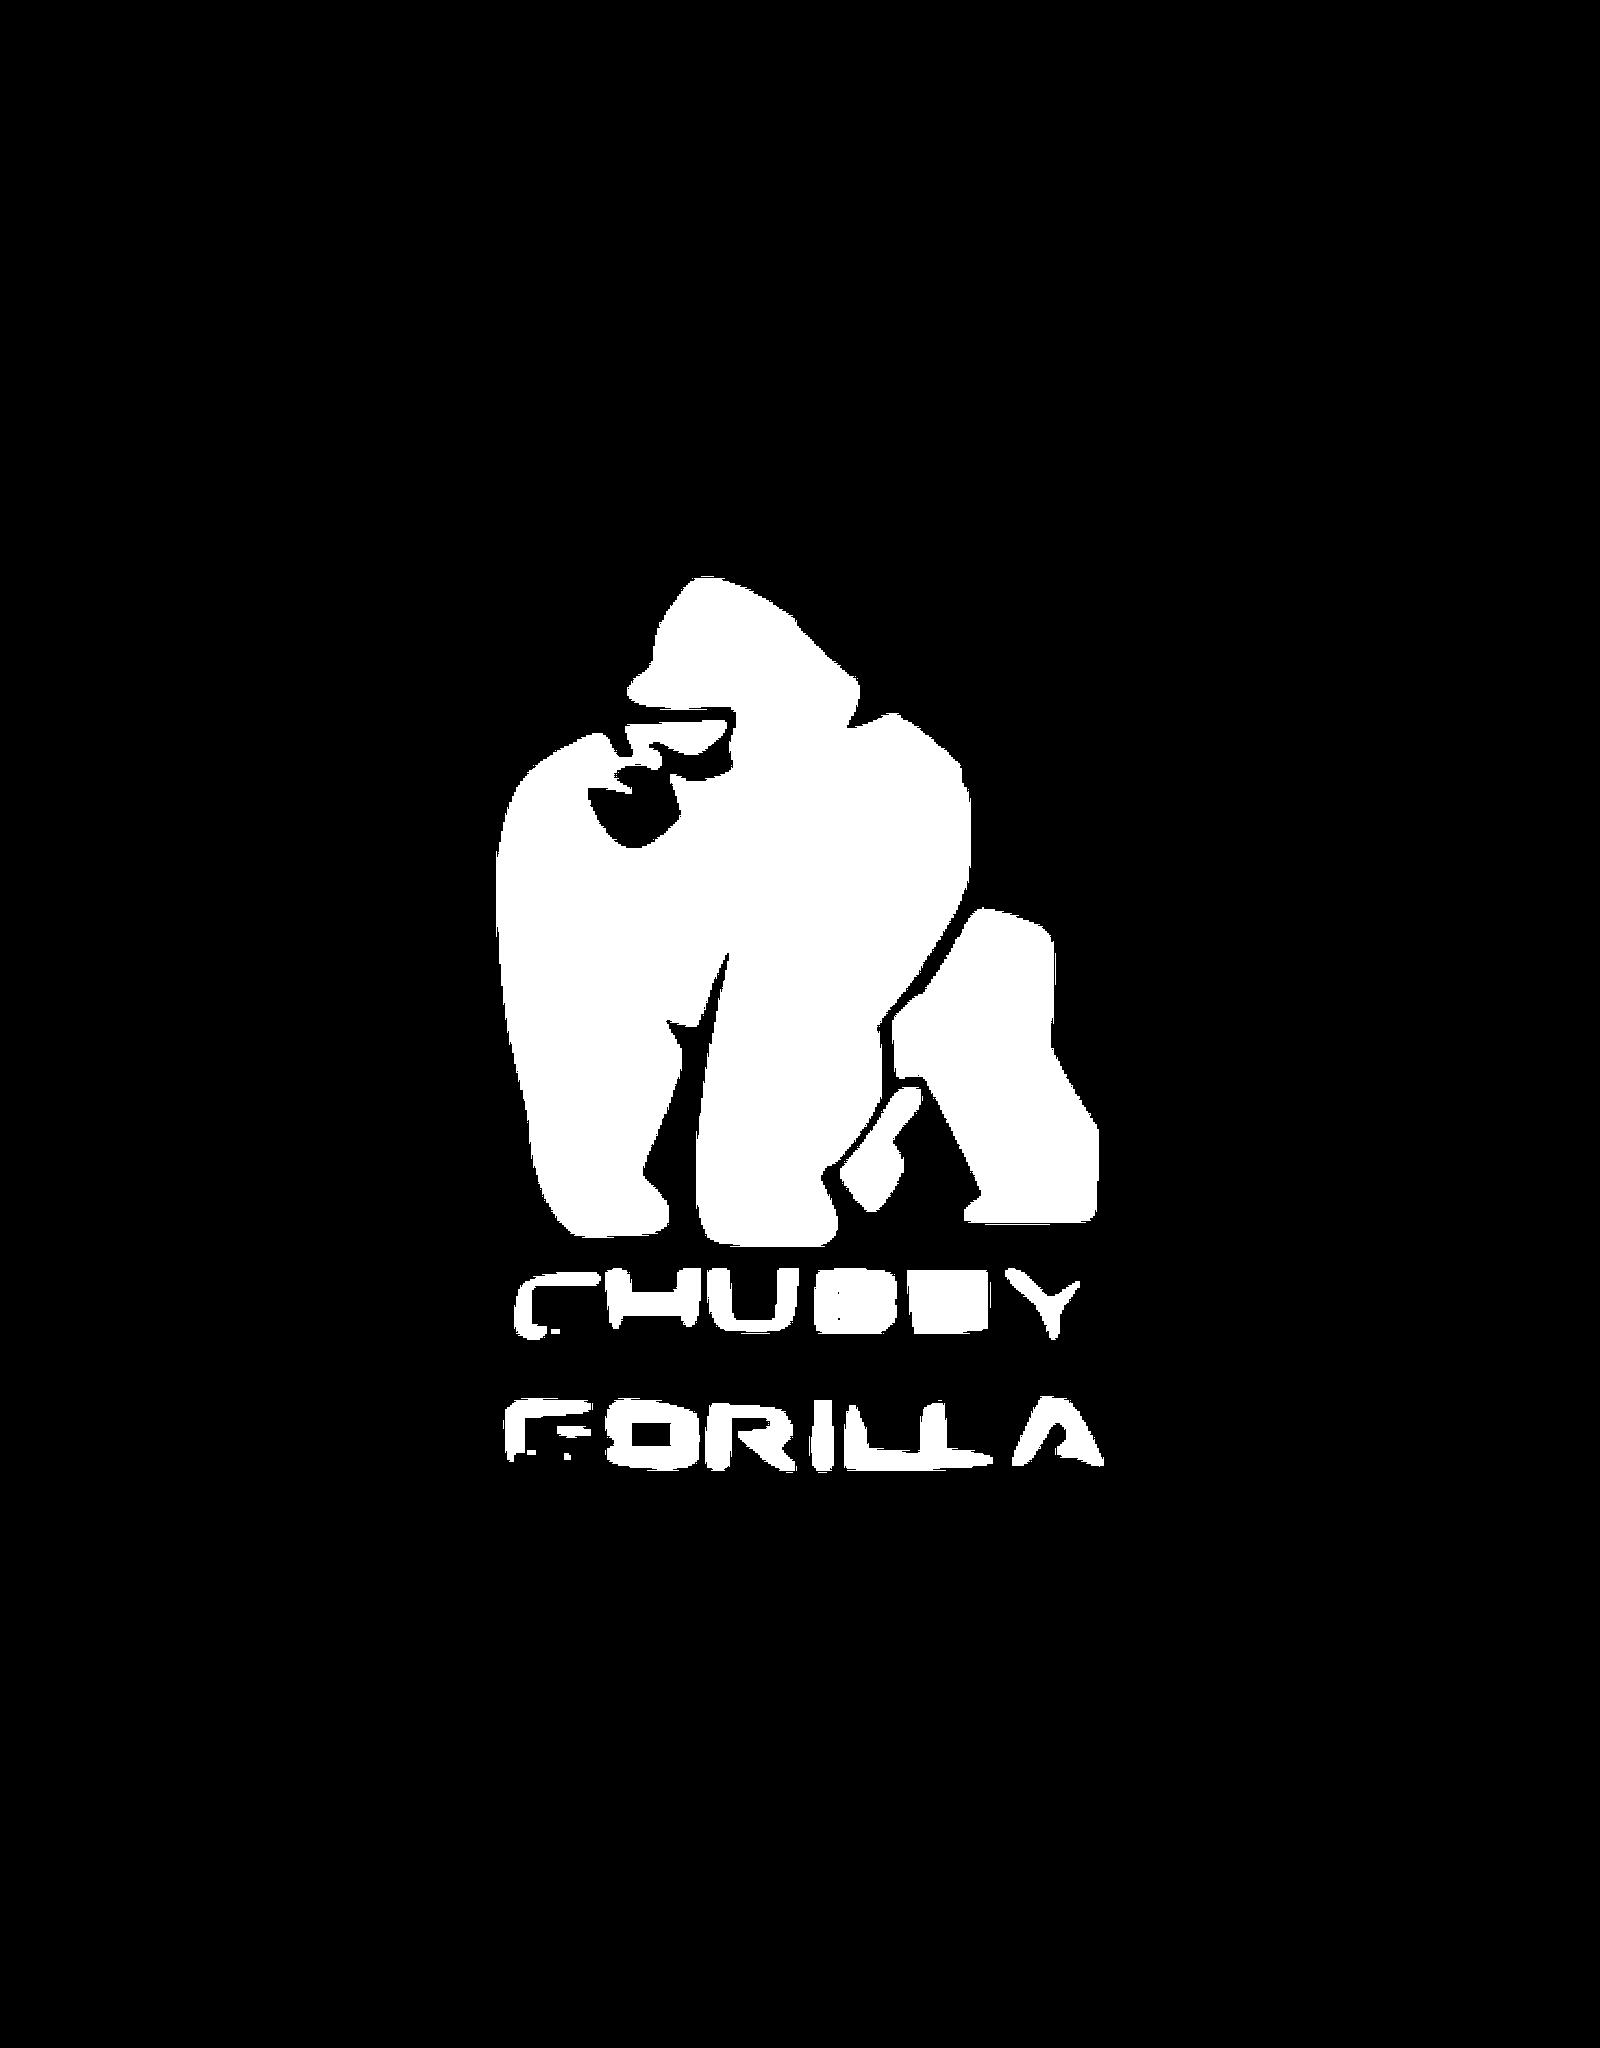 Chubby Gorilla Battery Case by Chubby Gorilla